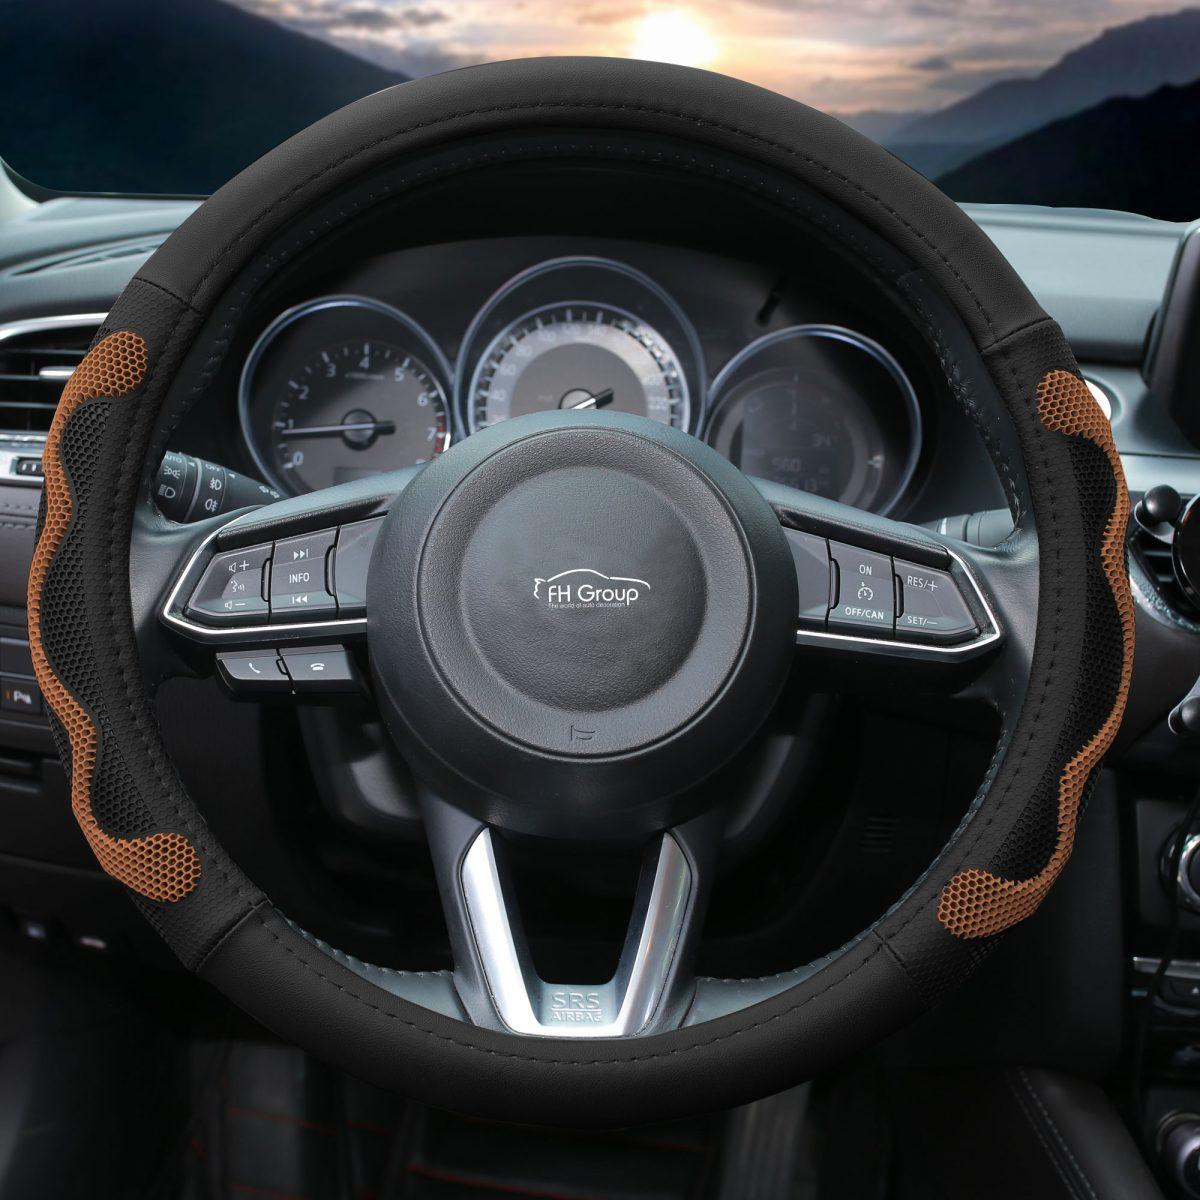 fh2010_brown_2 car steering wheel cover